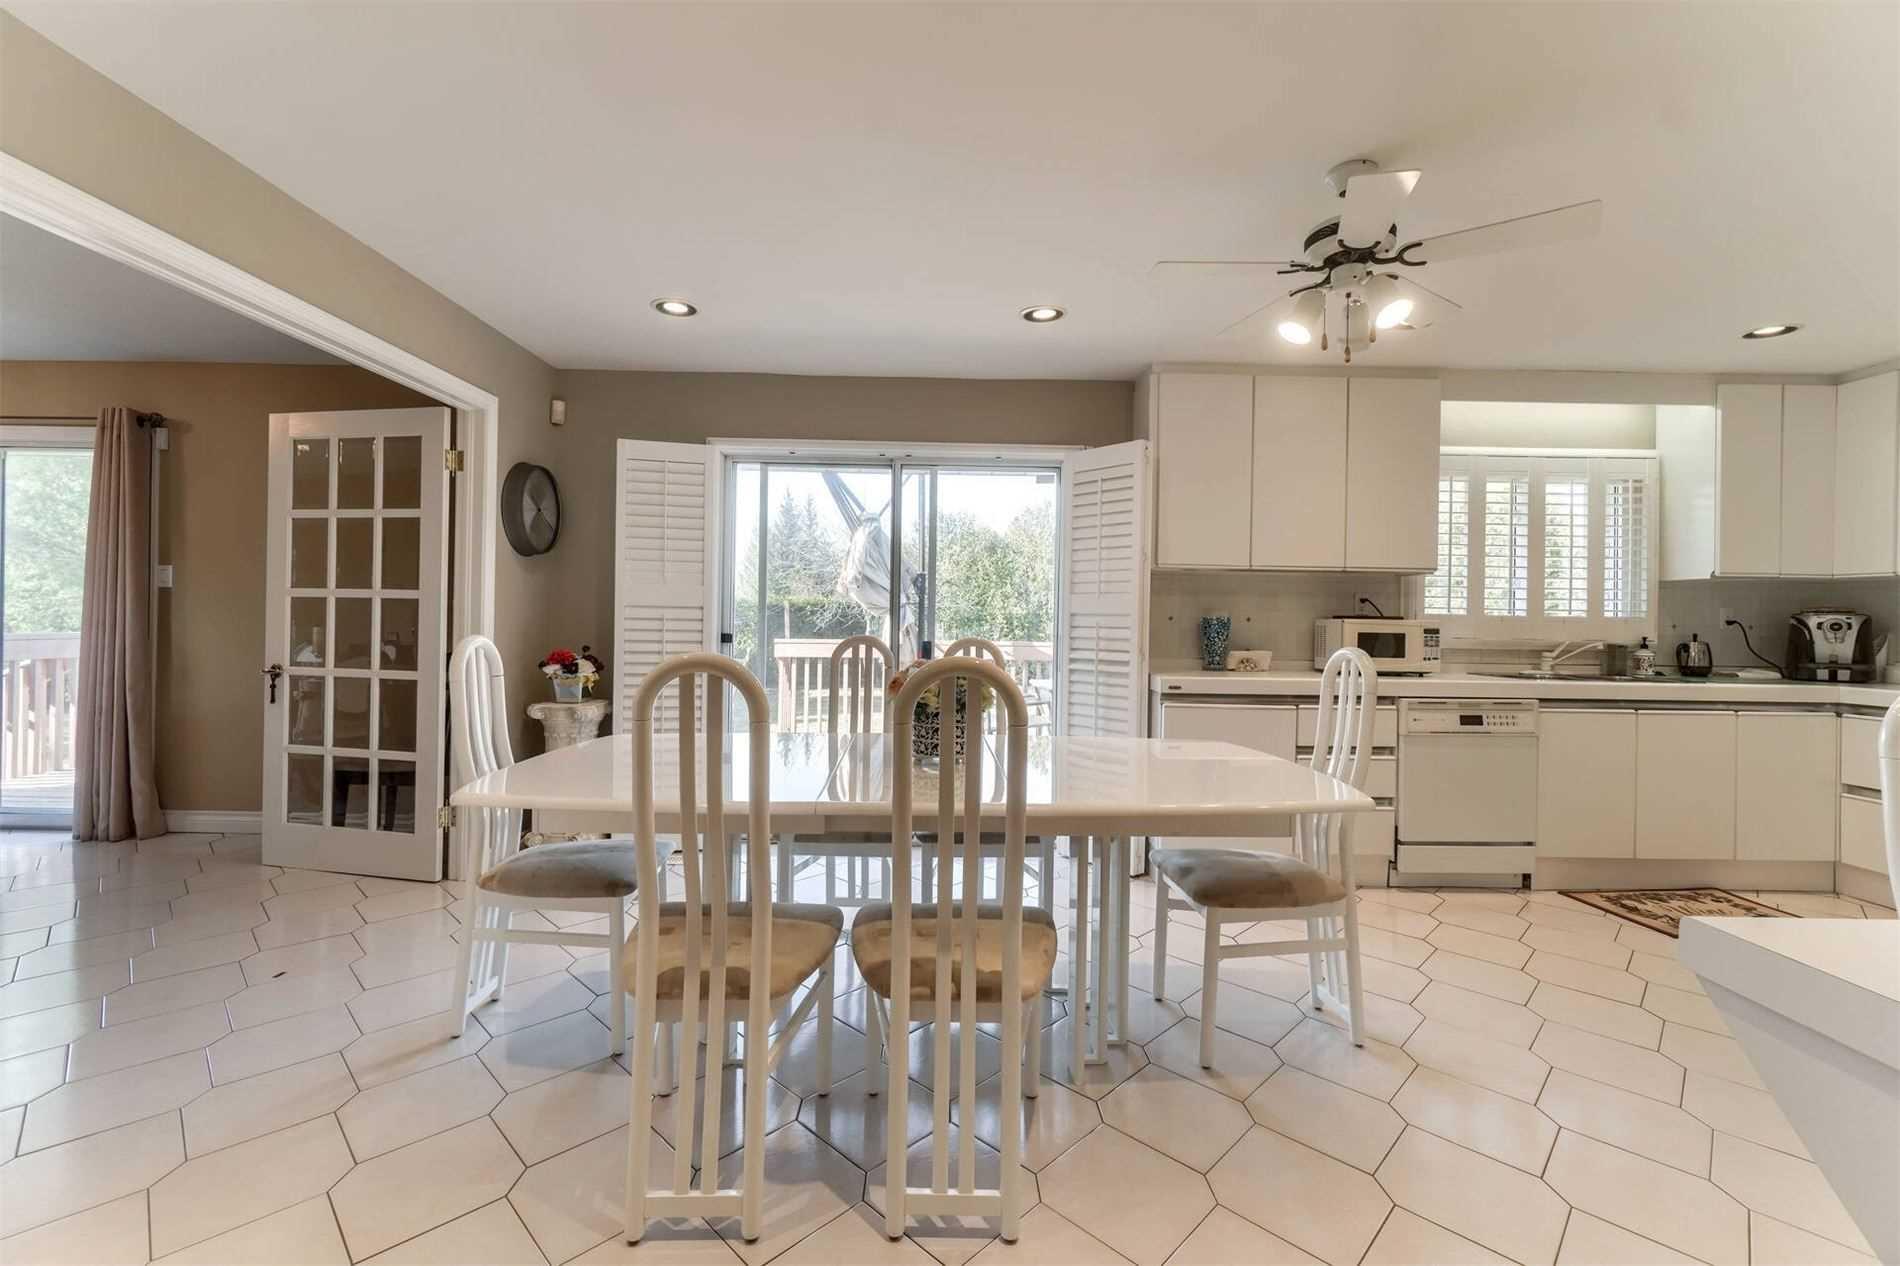 10776 Mcvean Dr, Brampton, Ontario L6P0J5, 3 Bedrooms Bedrooms, 8 Rooms Rooms,2 BathroomsBathrooms,Detached,For Sale,Mcvean,W5164216